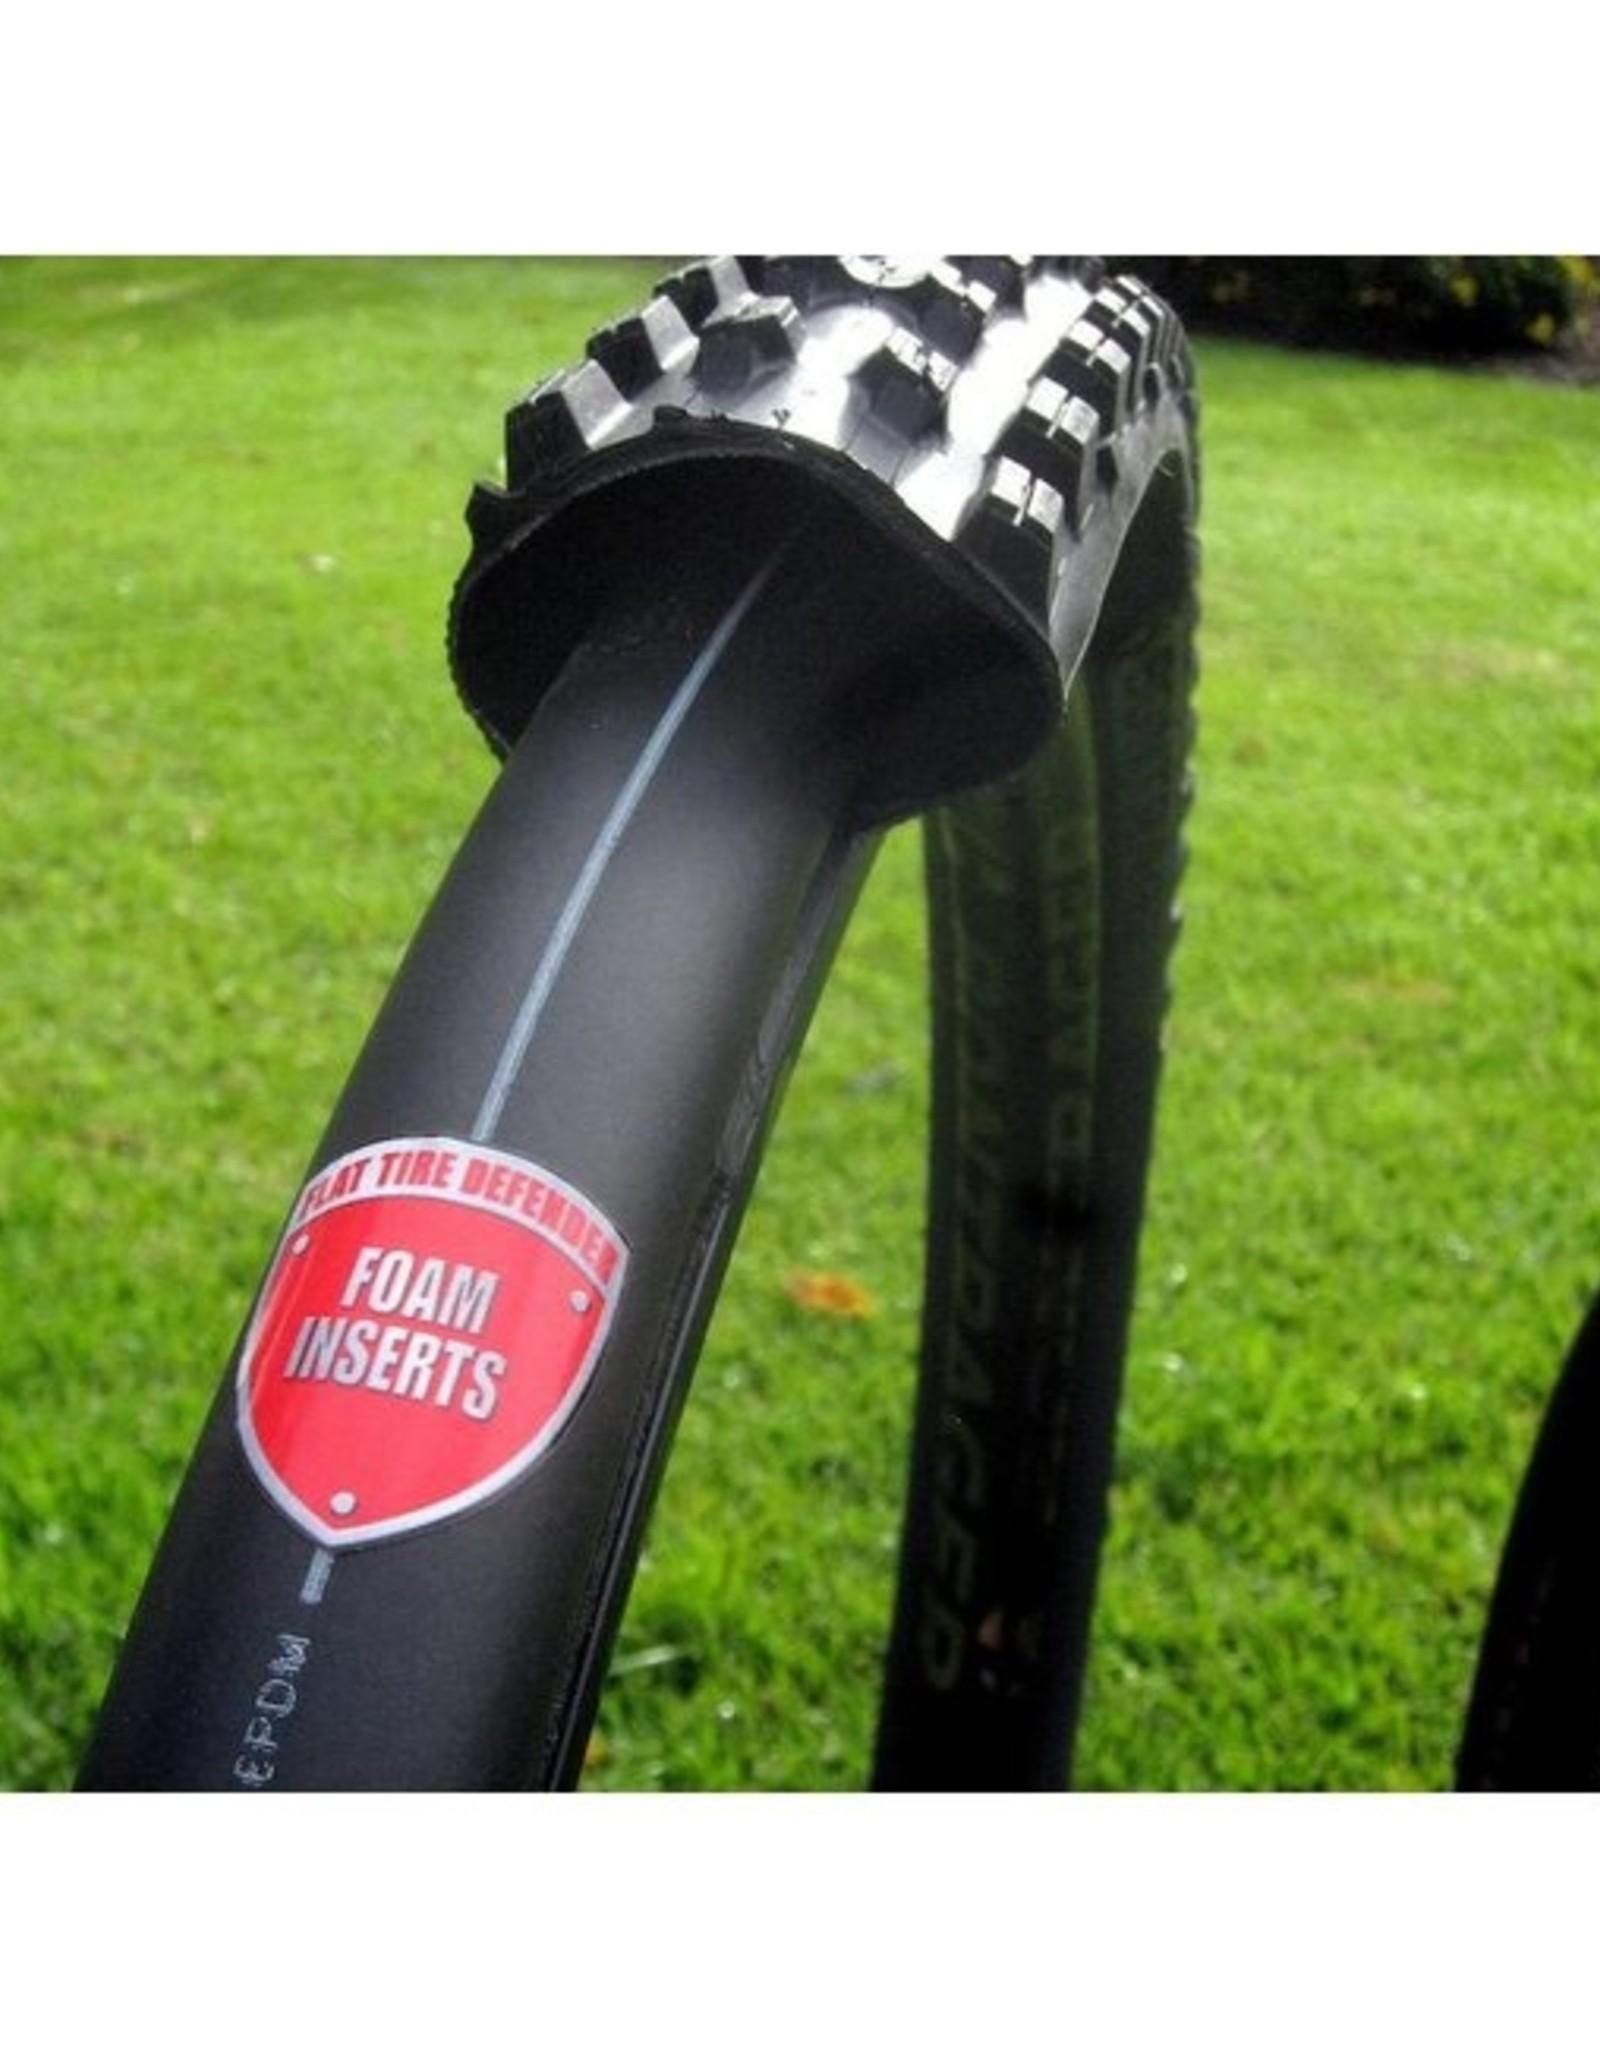 Flat Tire Defender Foam Inserts Flat Tire Defender Foam Inserts